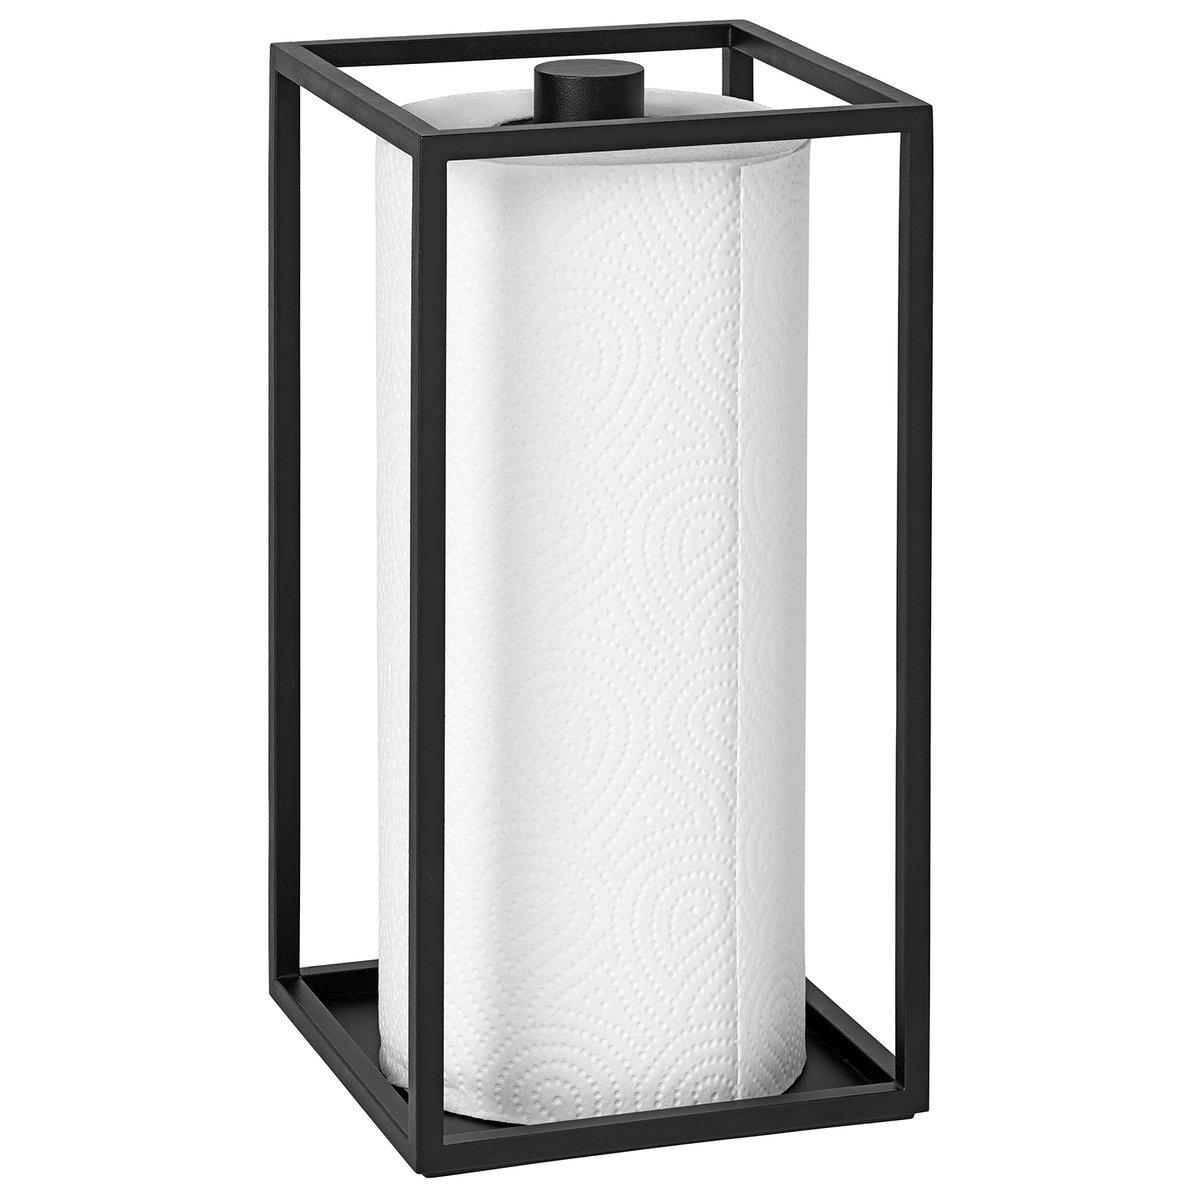 Kubus Roll\'in kitchen paper holder, black